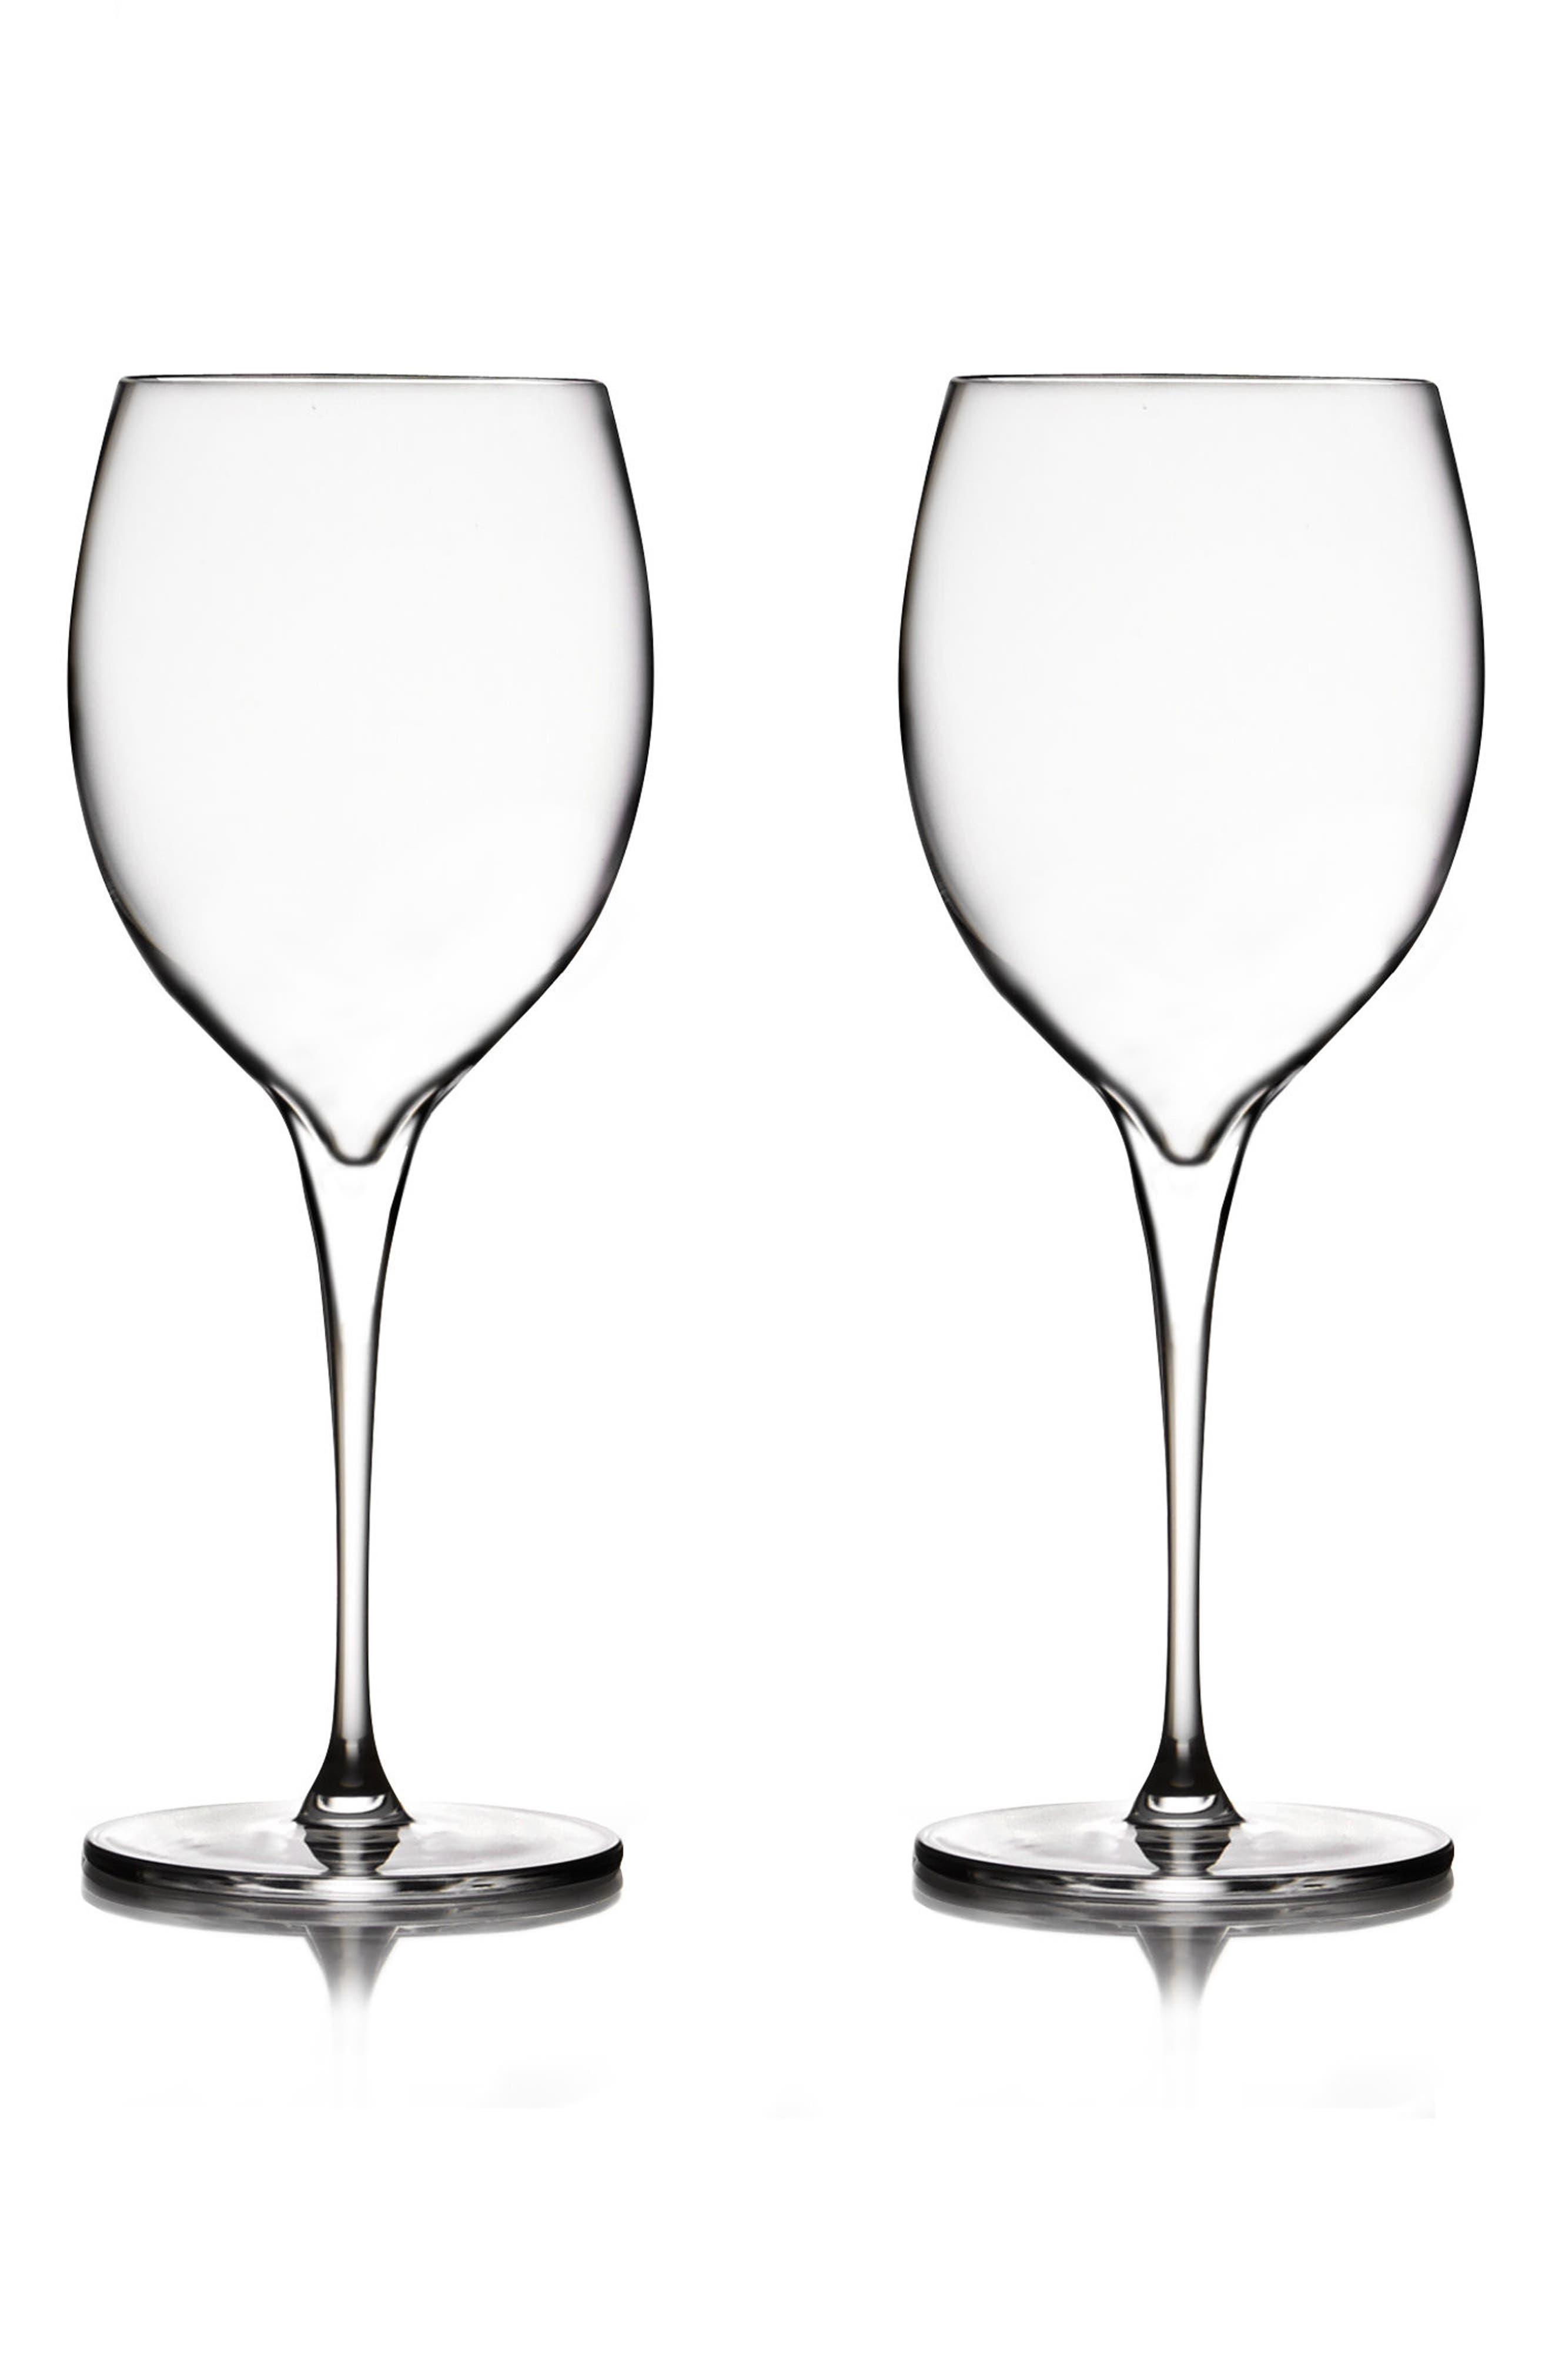 Vie Set of 2 Chardonnay Glasses,                         Main,                         color, 100